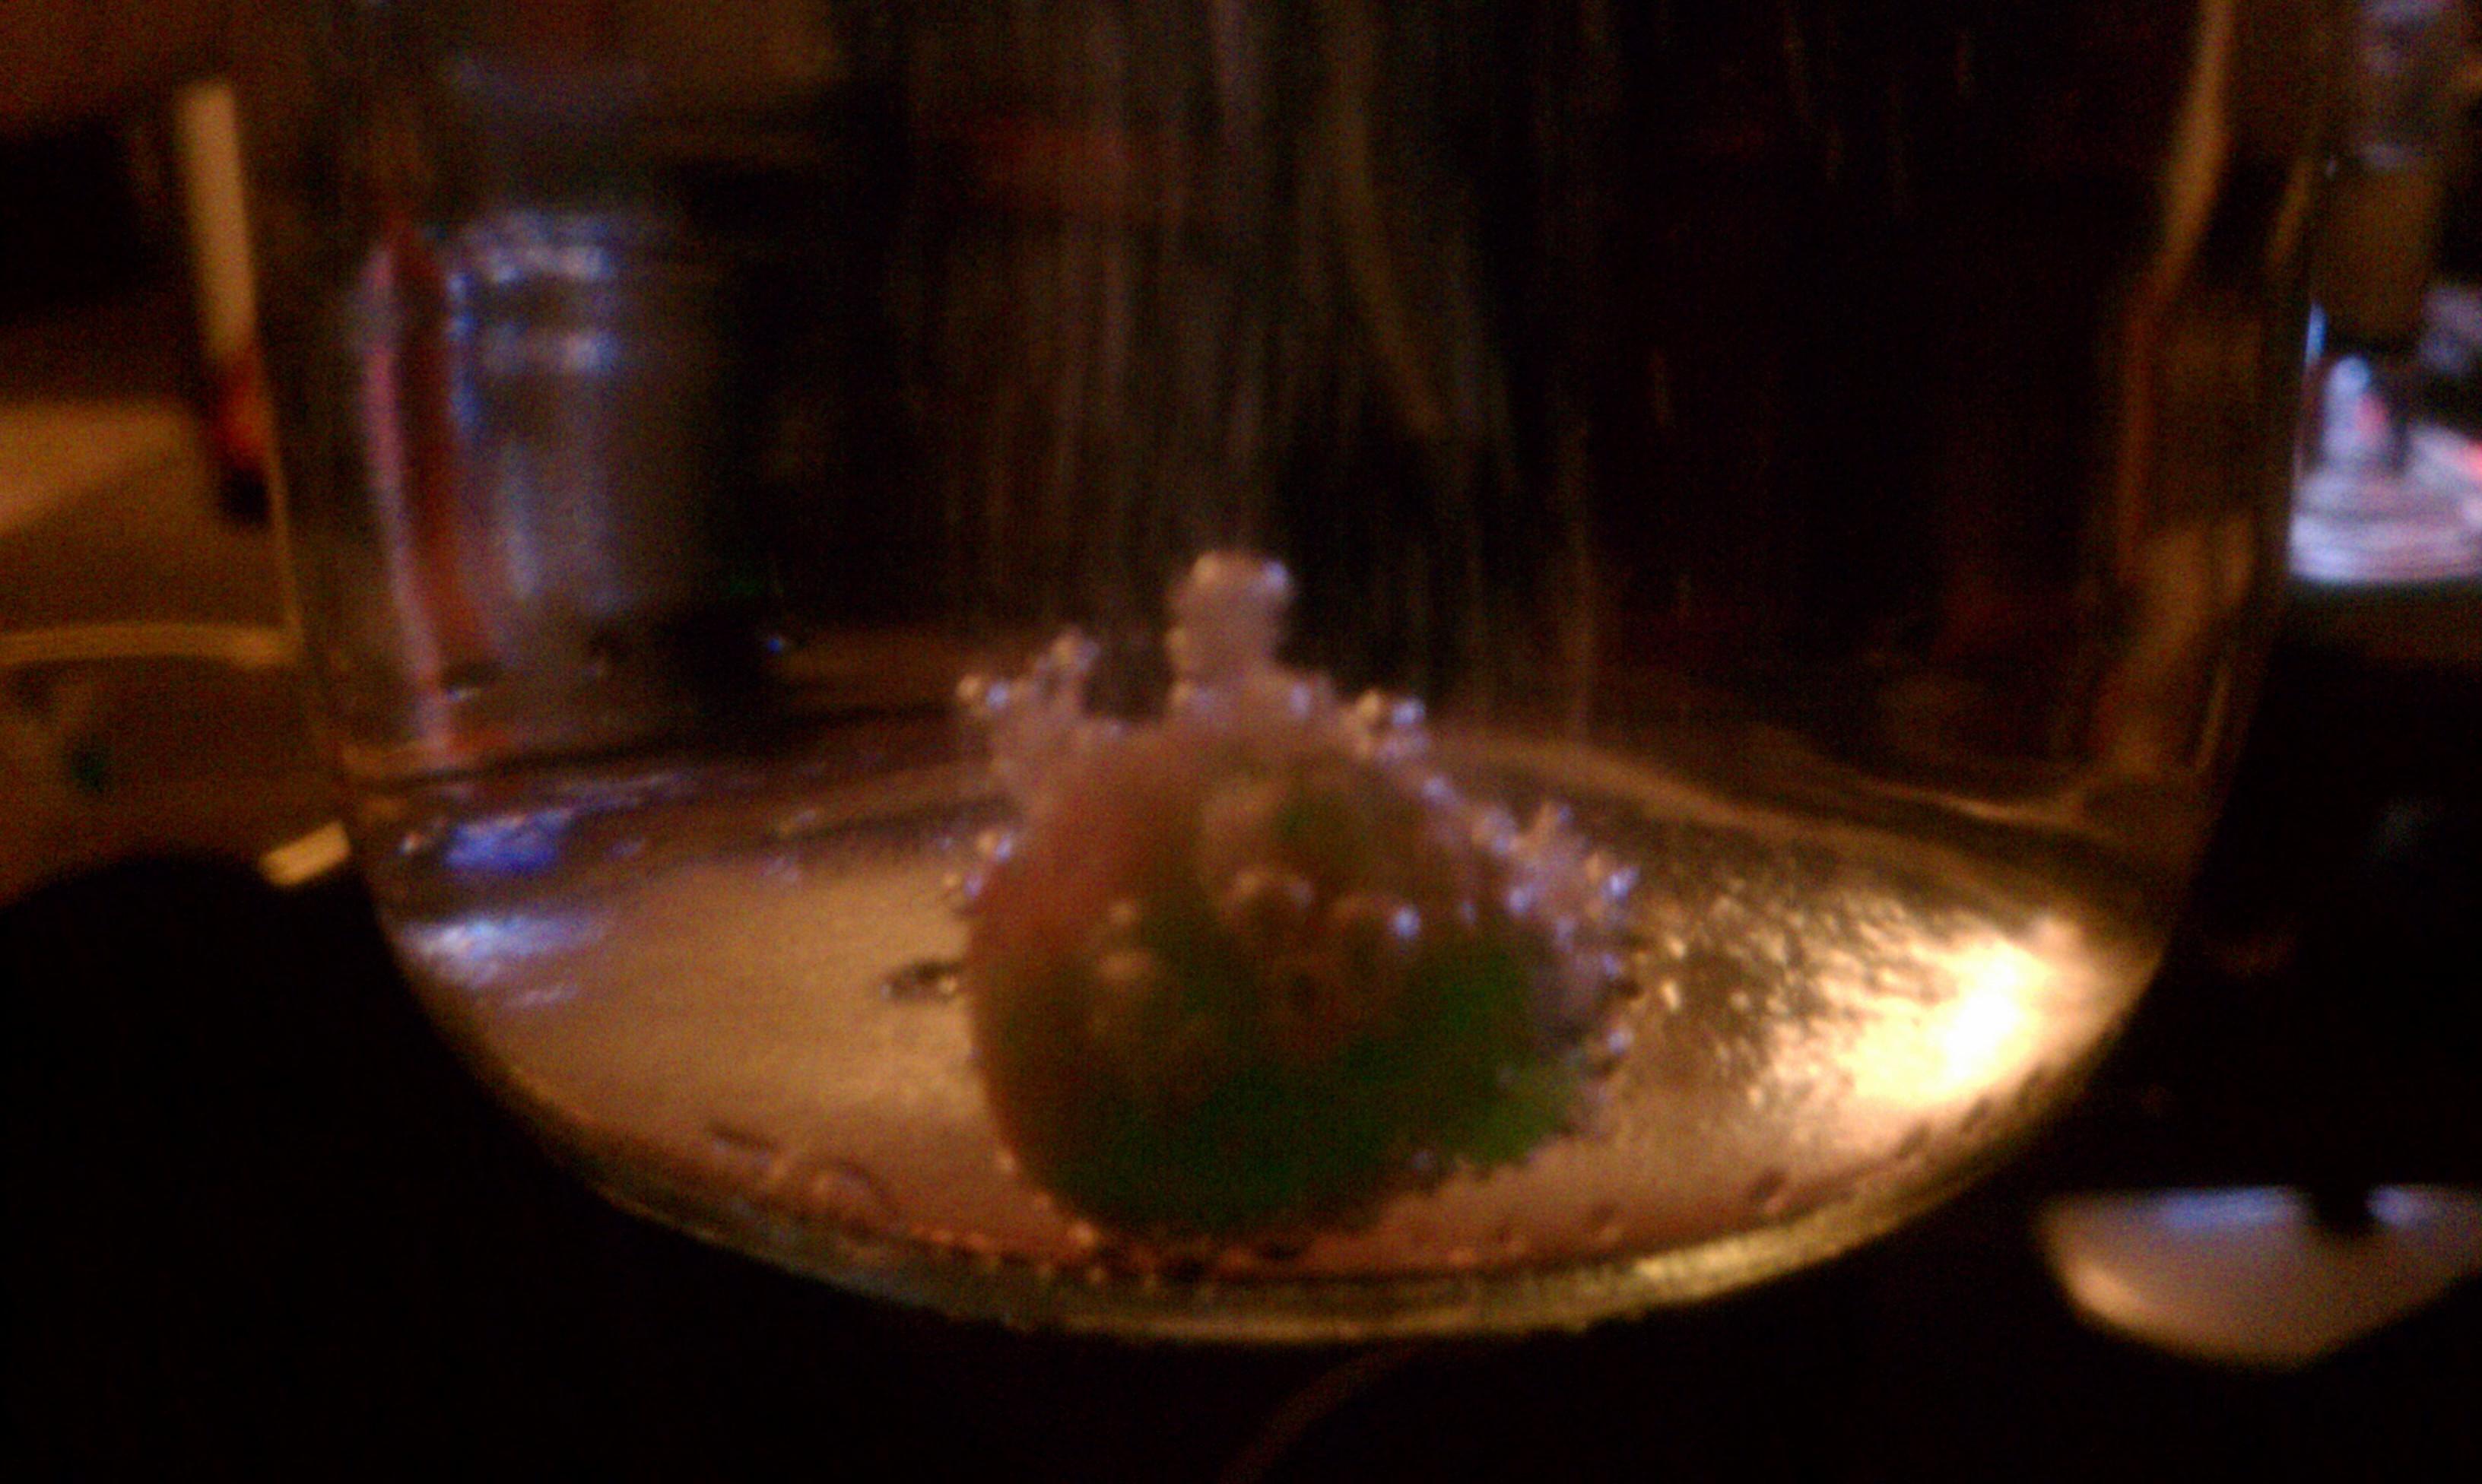 My living room, washington :: Trolli gummi rocks, dropped in pineapple smirnoff